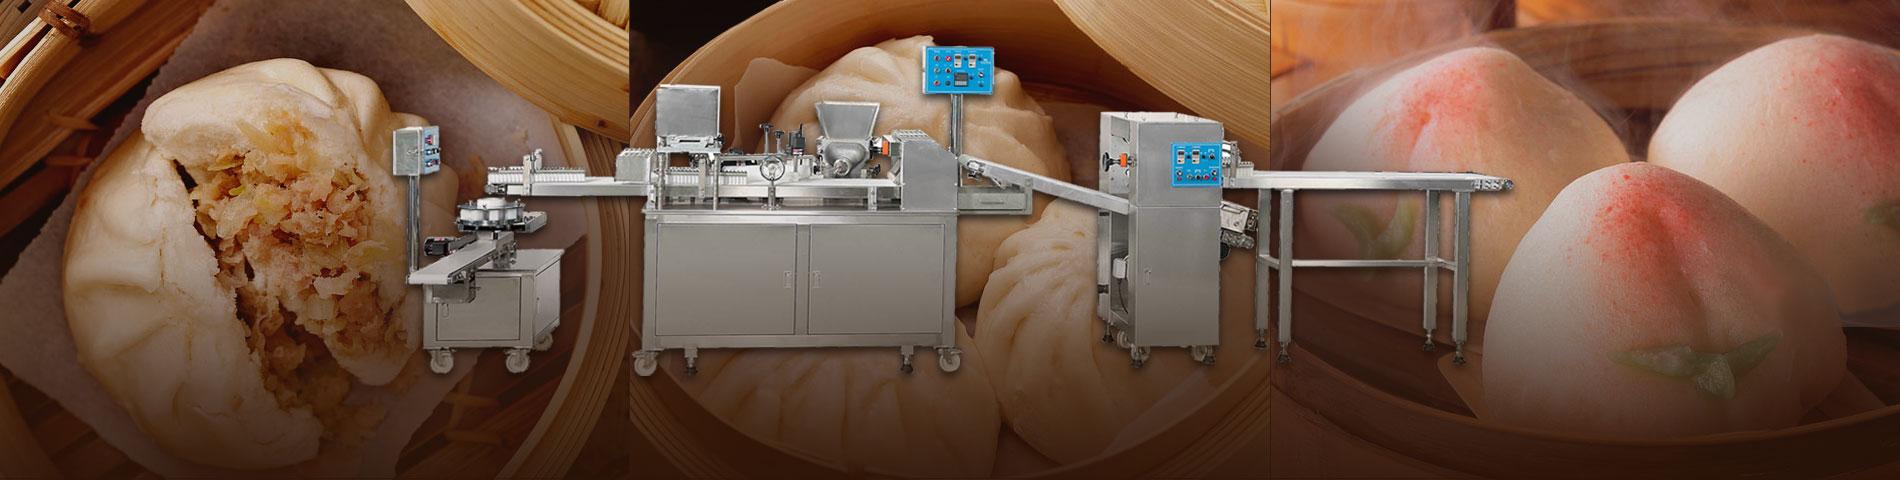 Steamed Bun TY-810S bun machine